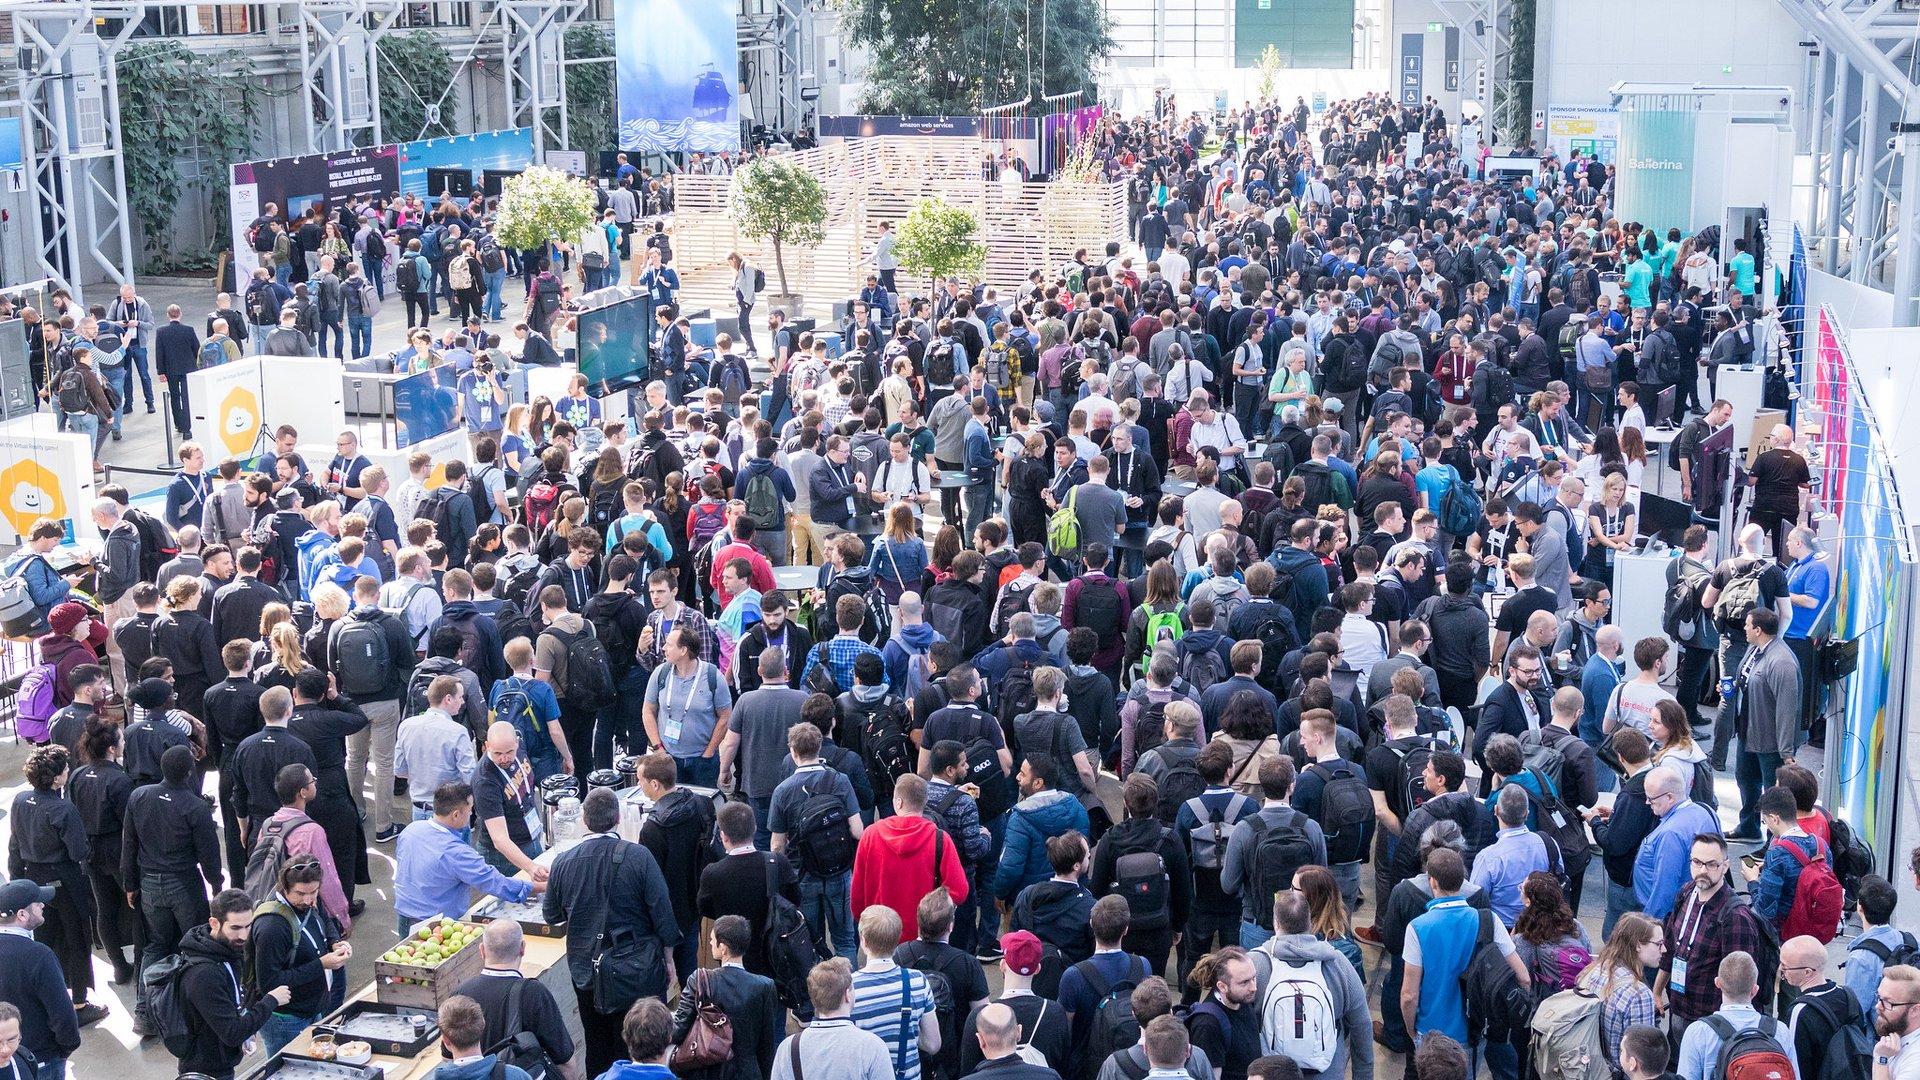 Crowds on the show floor at KubeCon + CloudNativeCon 2018 in Copenhagen, Denmark.